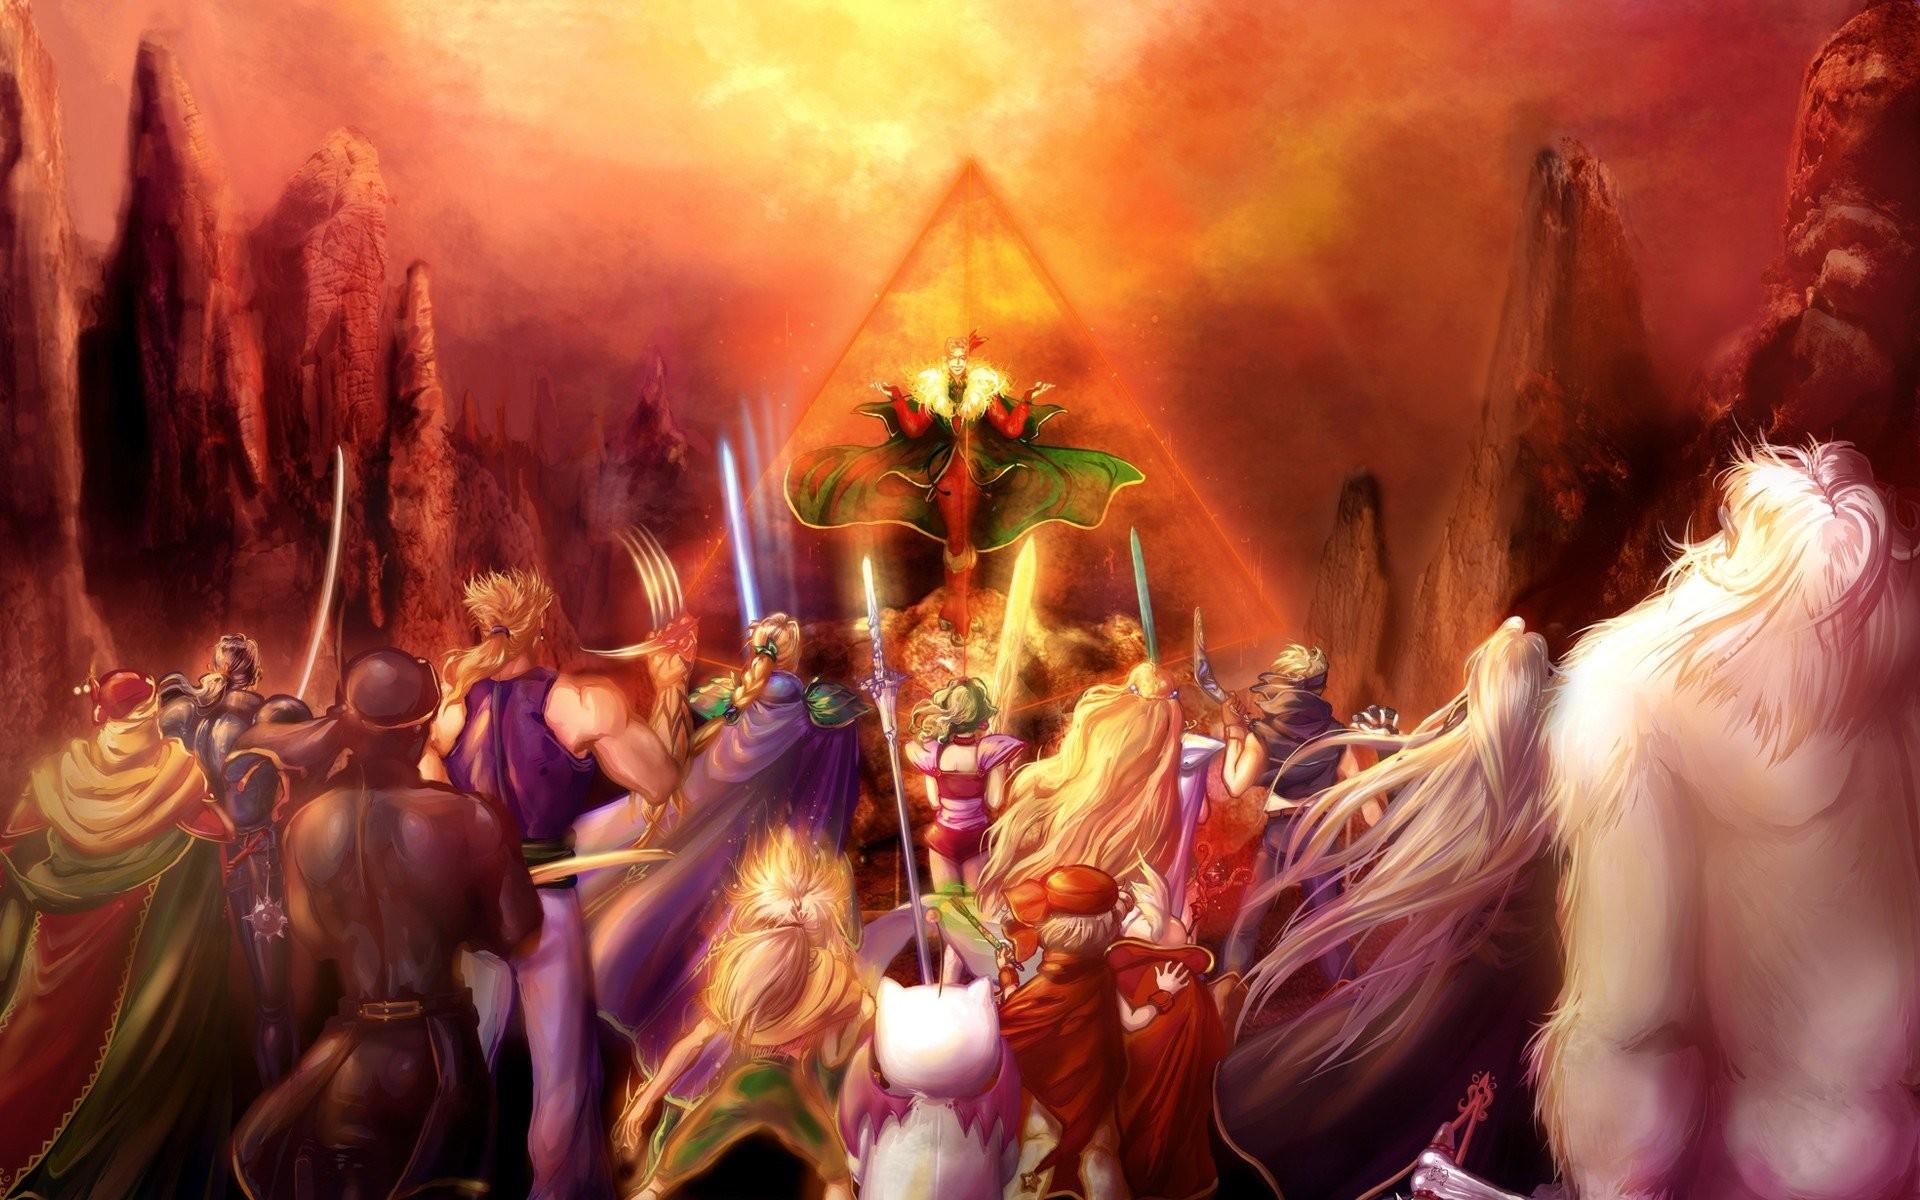 Final Fantasy VI Locke Cole Terra Branford Kefka Palazzo …